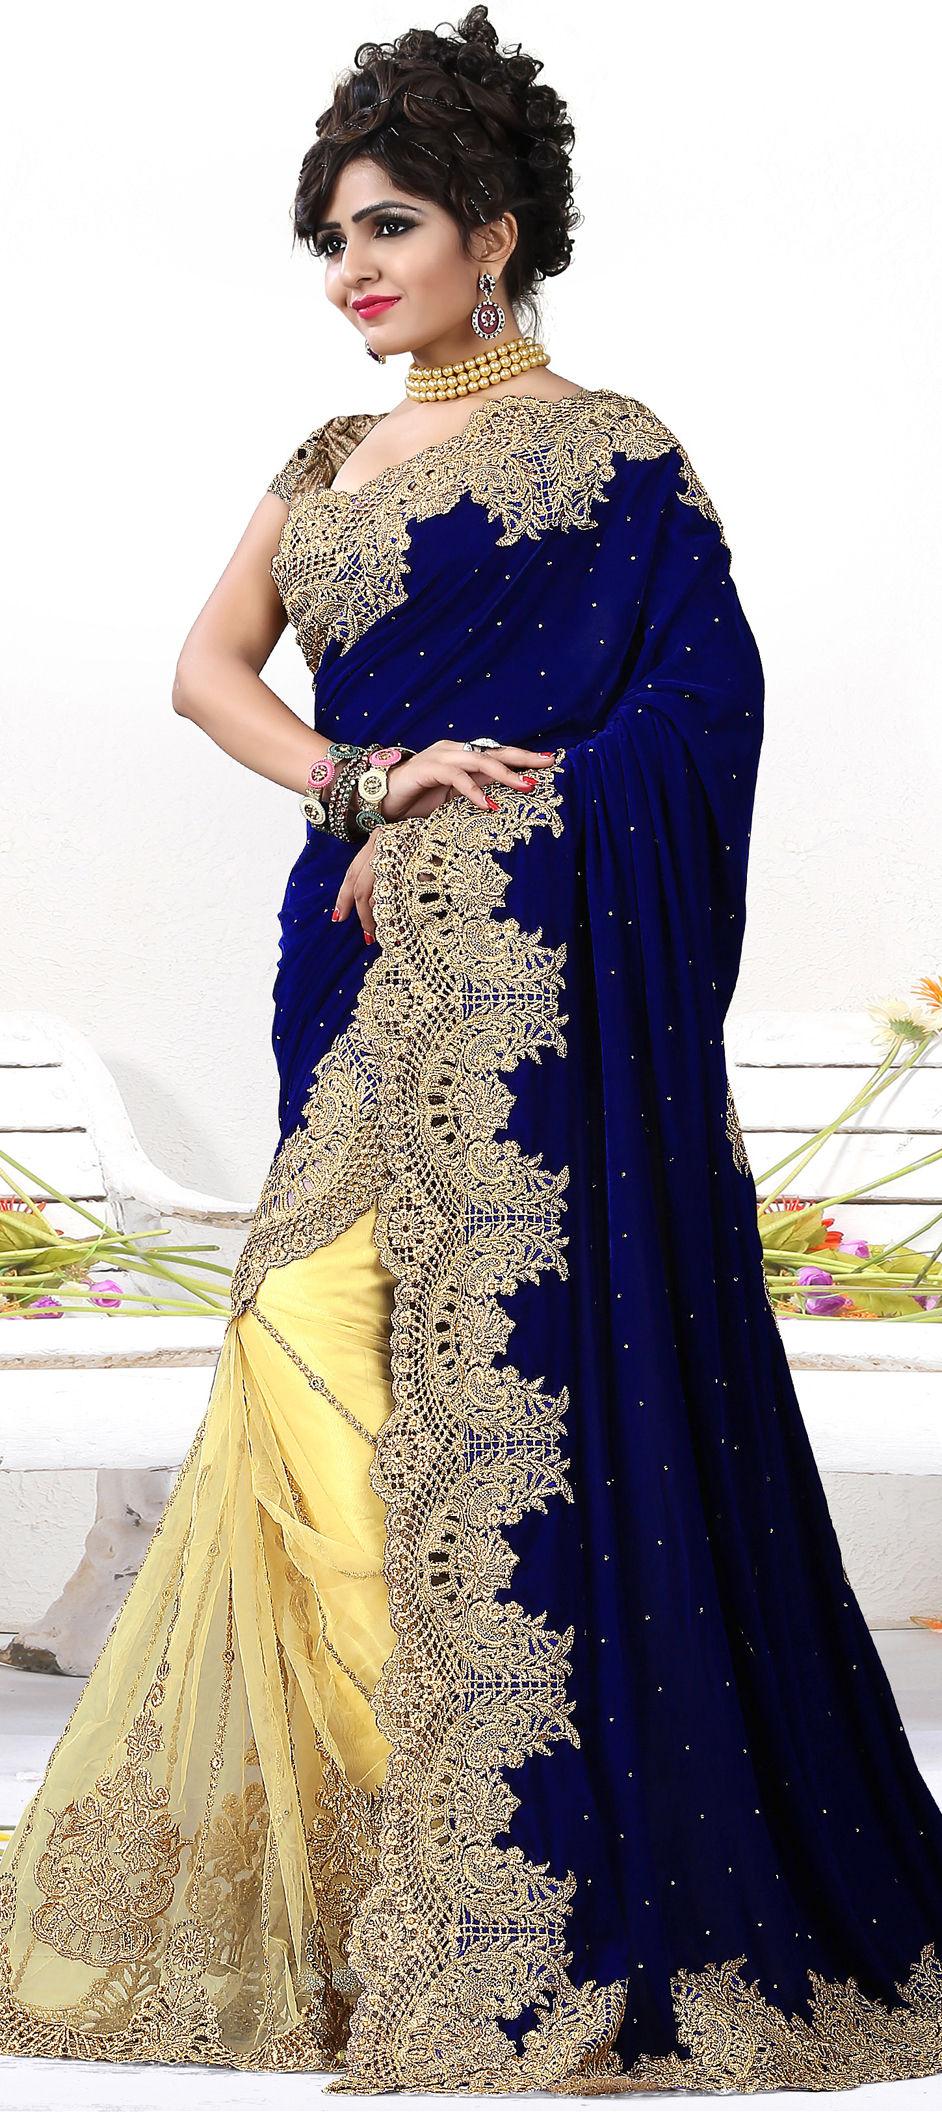 Bridal Wedding Blue Yellow Color Net Velvet Fabric Saree 165141